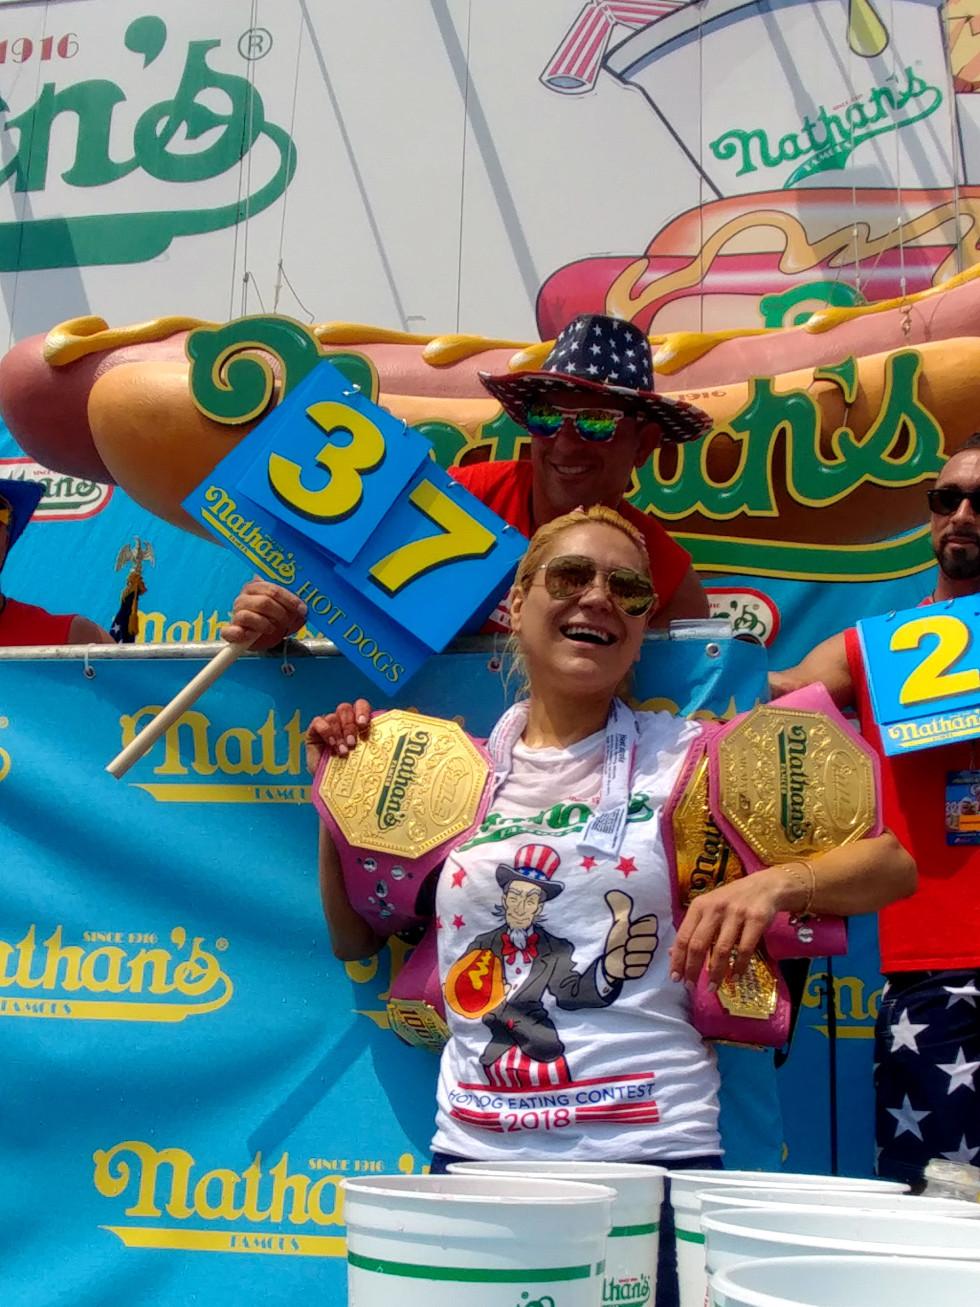 Joey Chestbut Miki Sudo 5-time champ